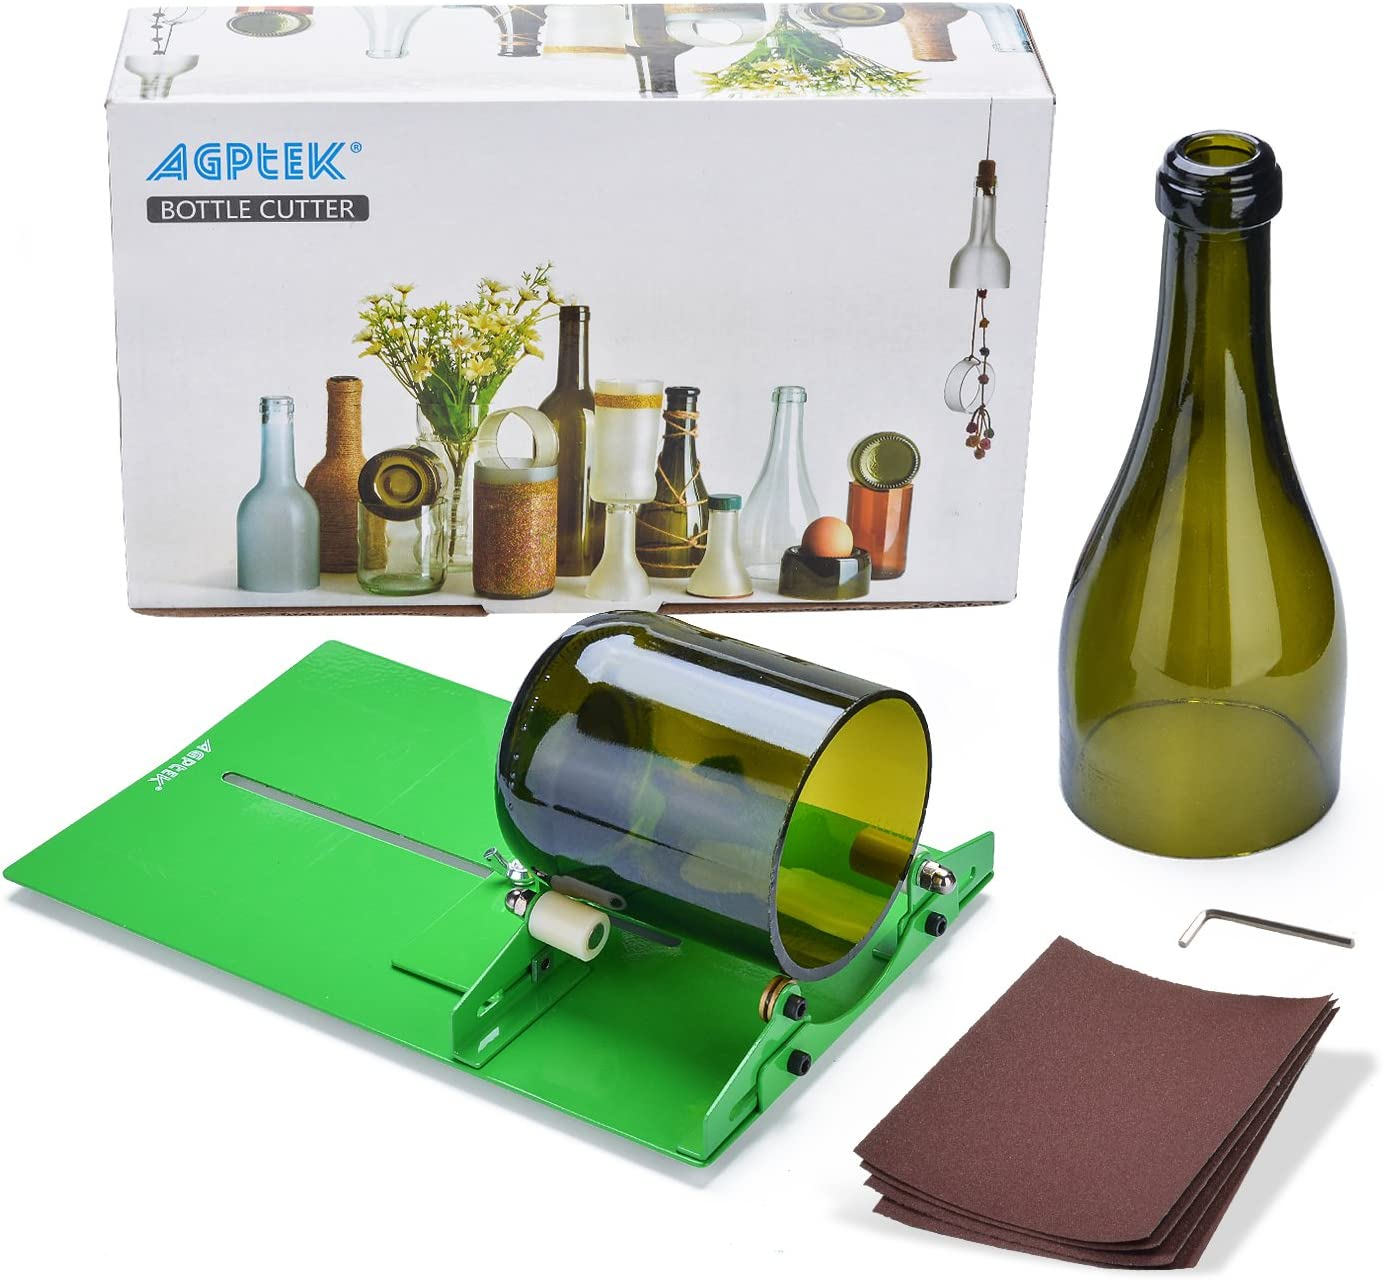 AGPTEK Cortador de Botellas de Vidrio Redondo, Herramienta para Cortar Botellas de Vidrieras, Bottle Cutter para Botellas de Cerveza - Carillones de Viento, Jarrones, Lámparas de Botellas